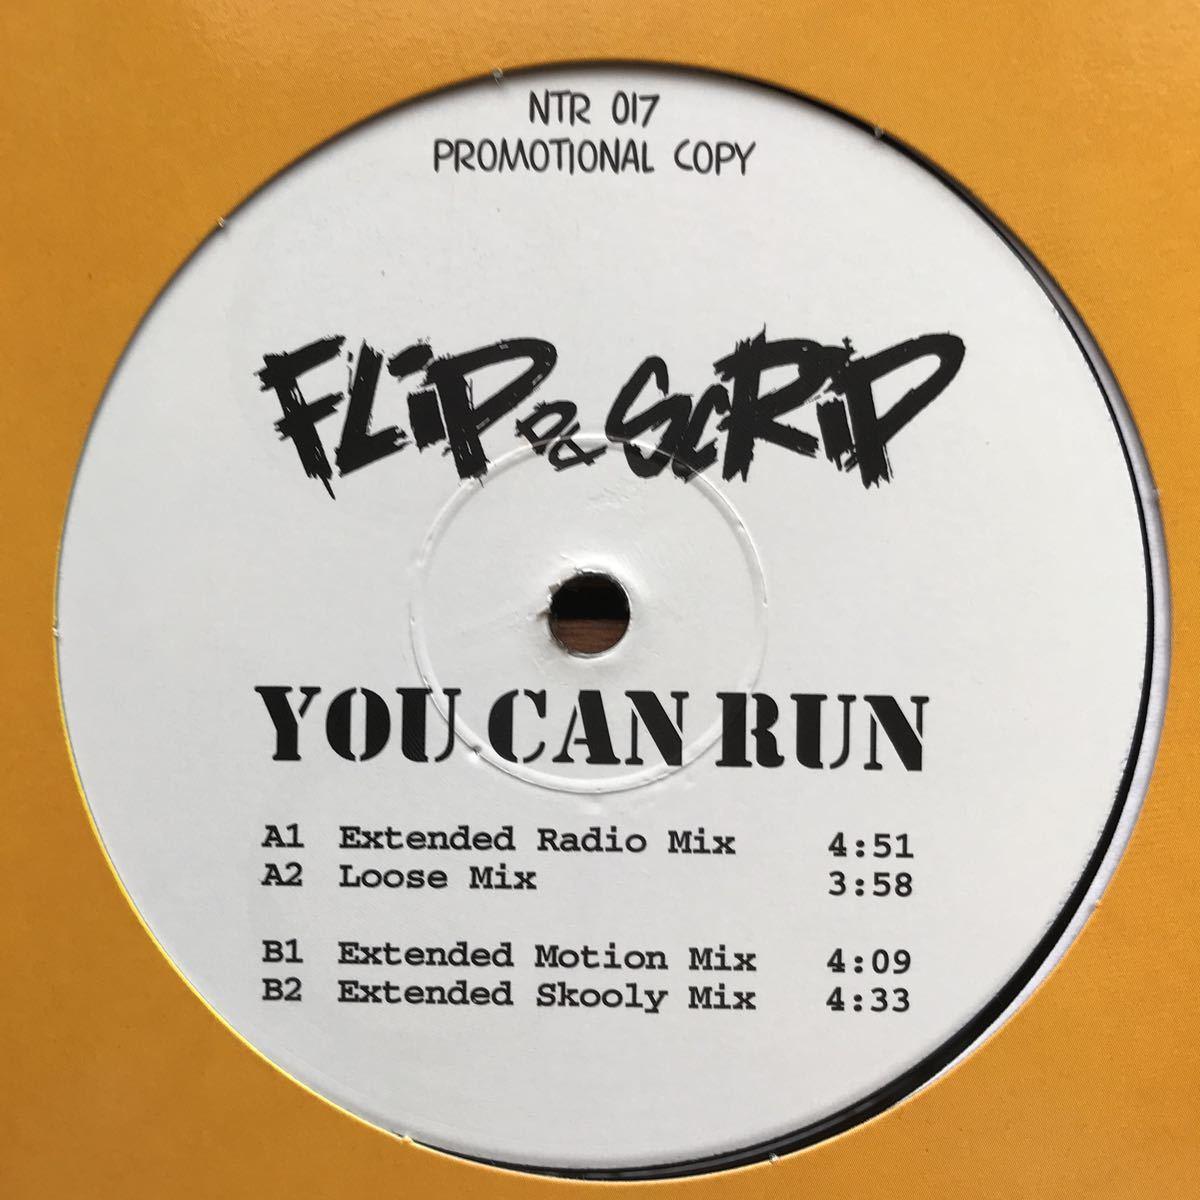 【eu-rap】Flip Da Scrip / You Can Run[12inch]オリジナル盤《1-4》nightown レーベル